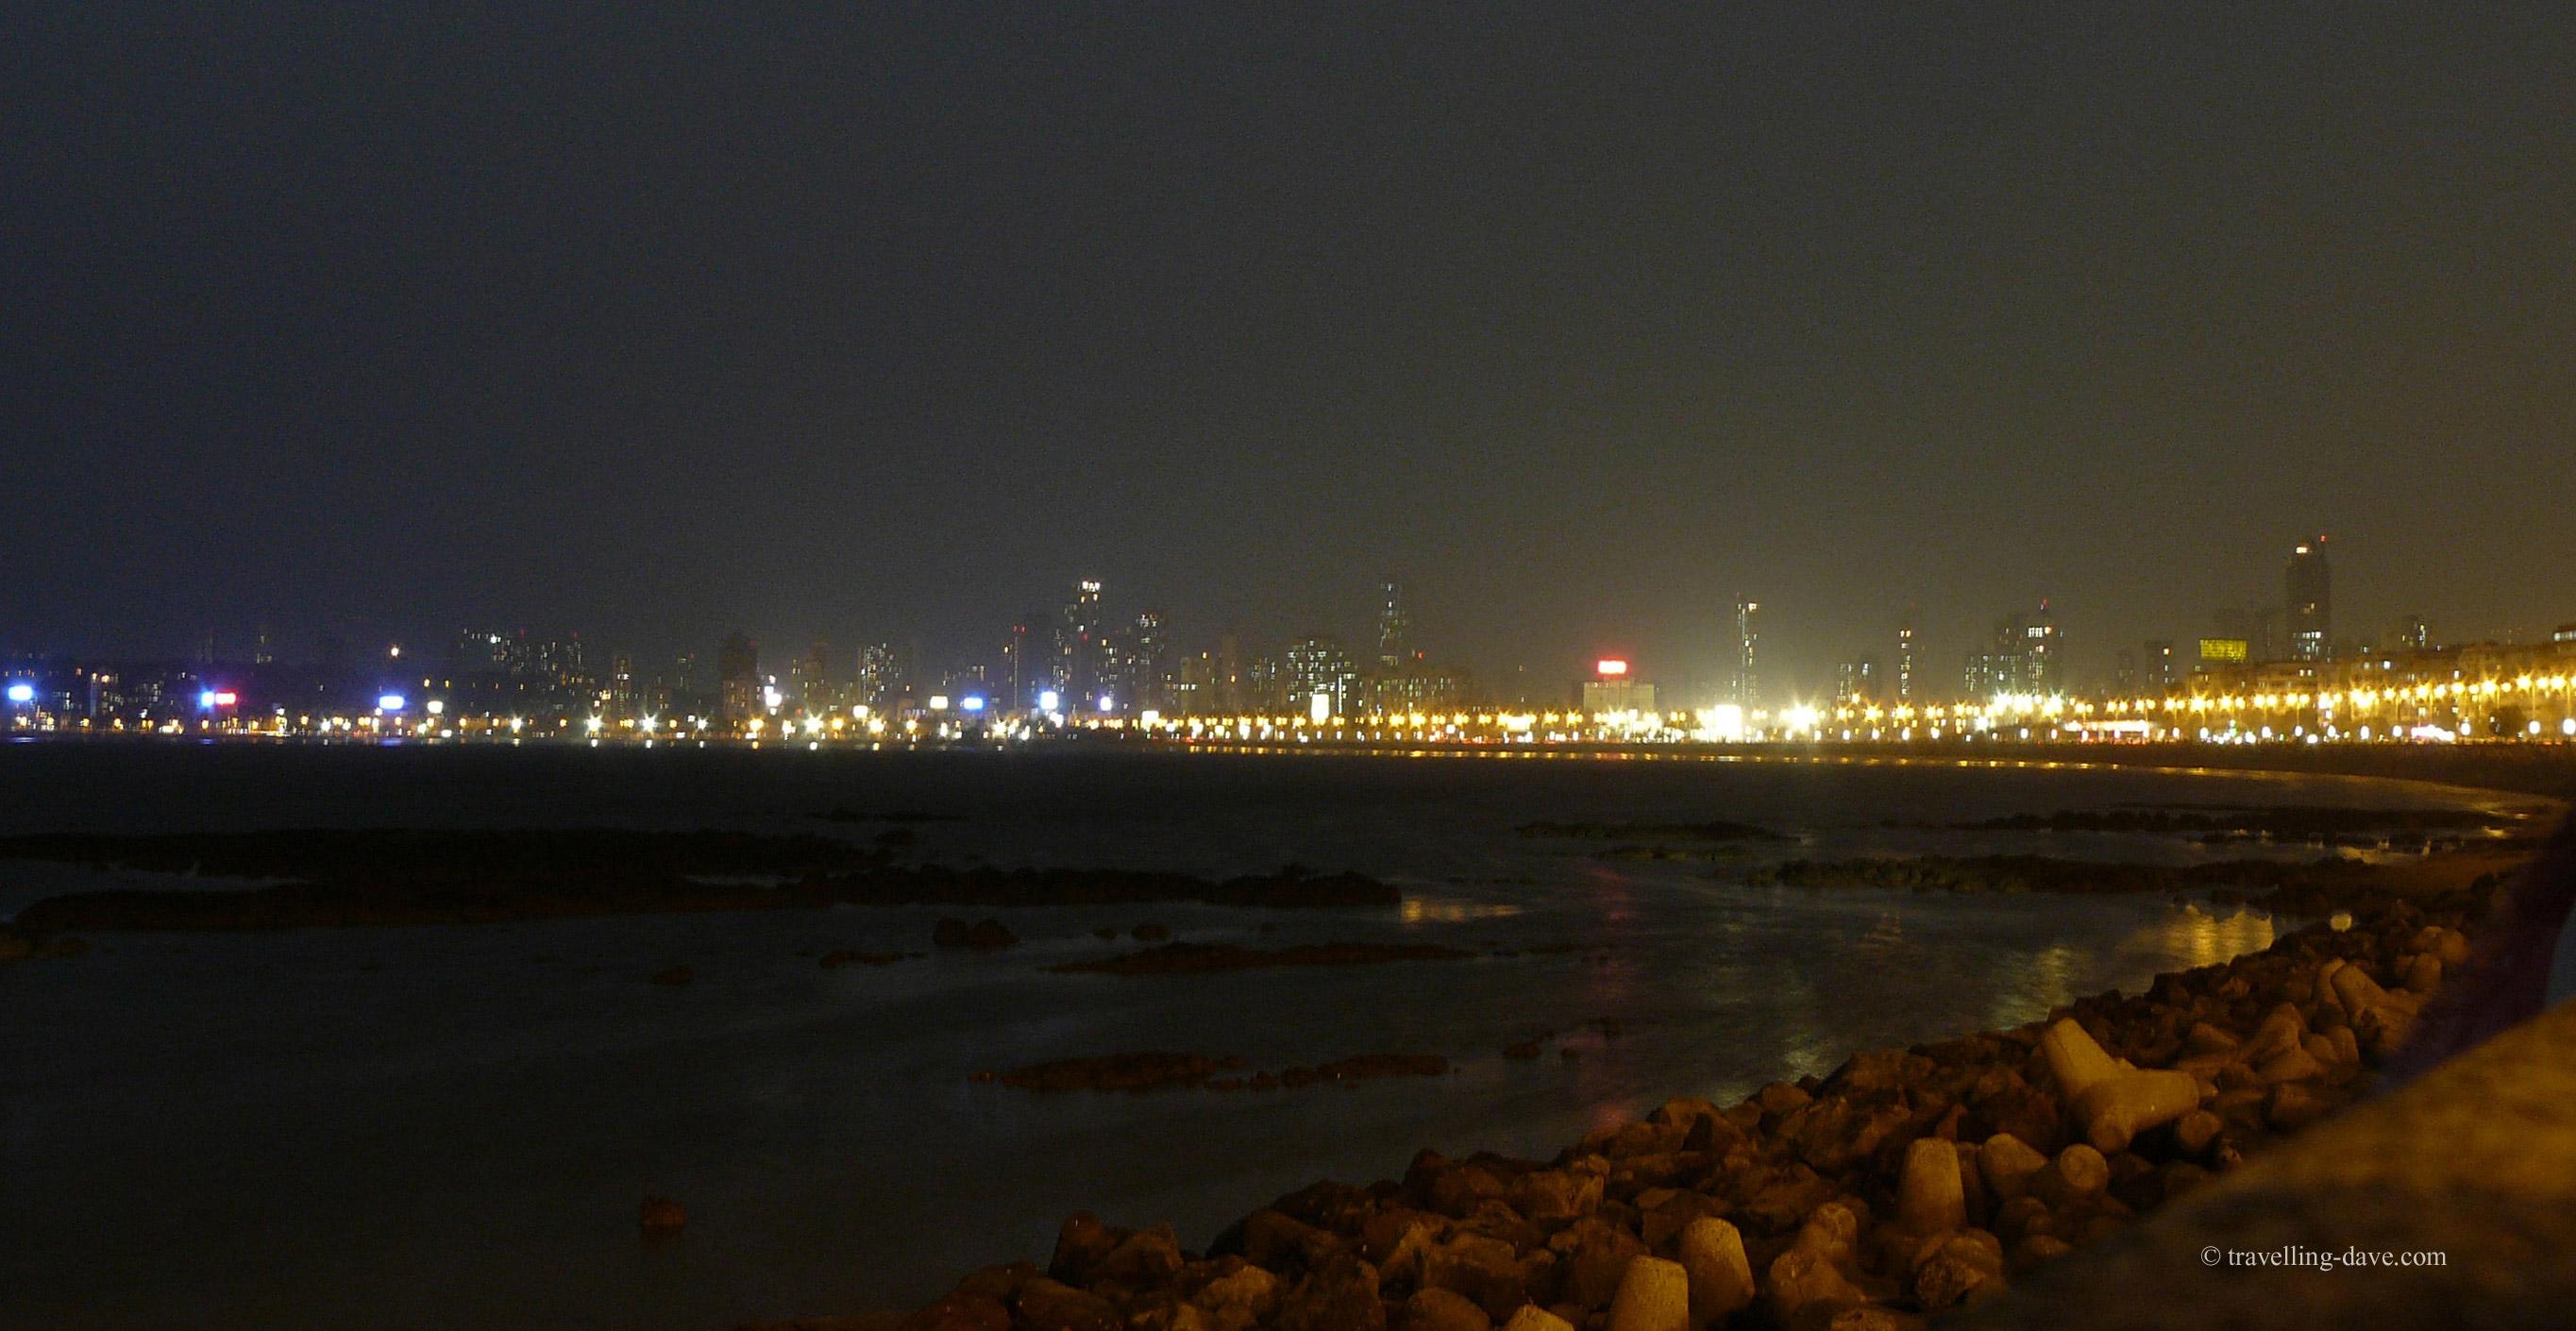 Evening at Marine Drive in Mumbai